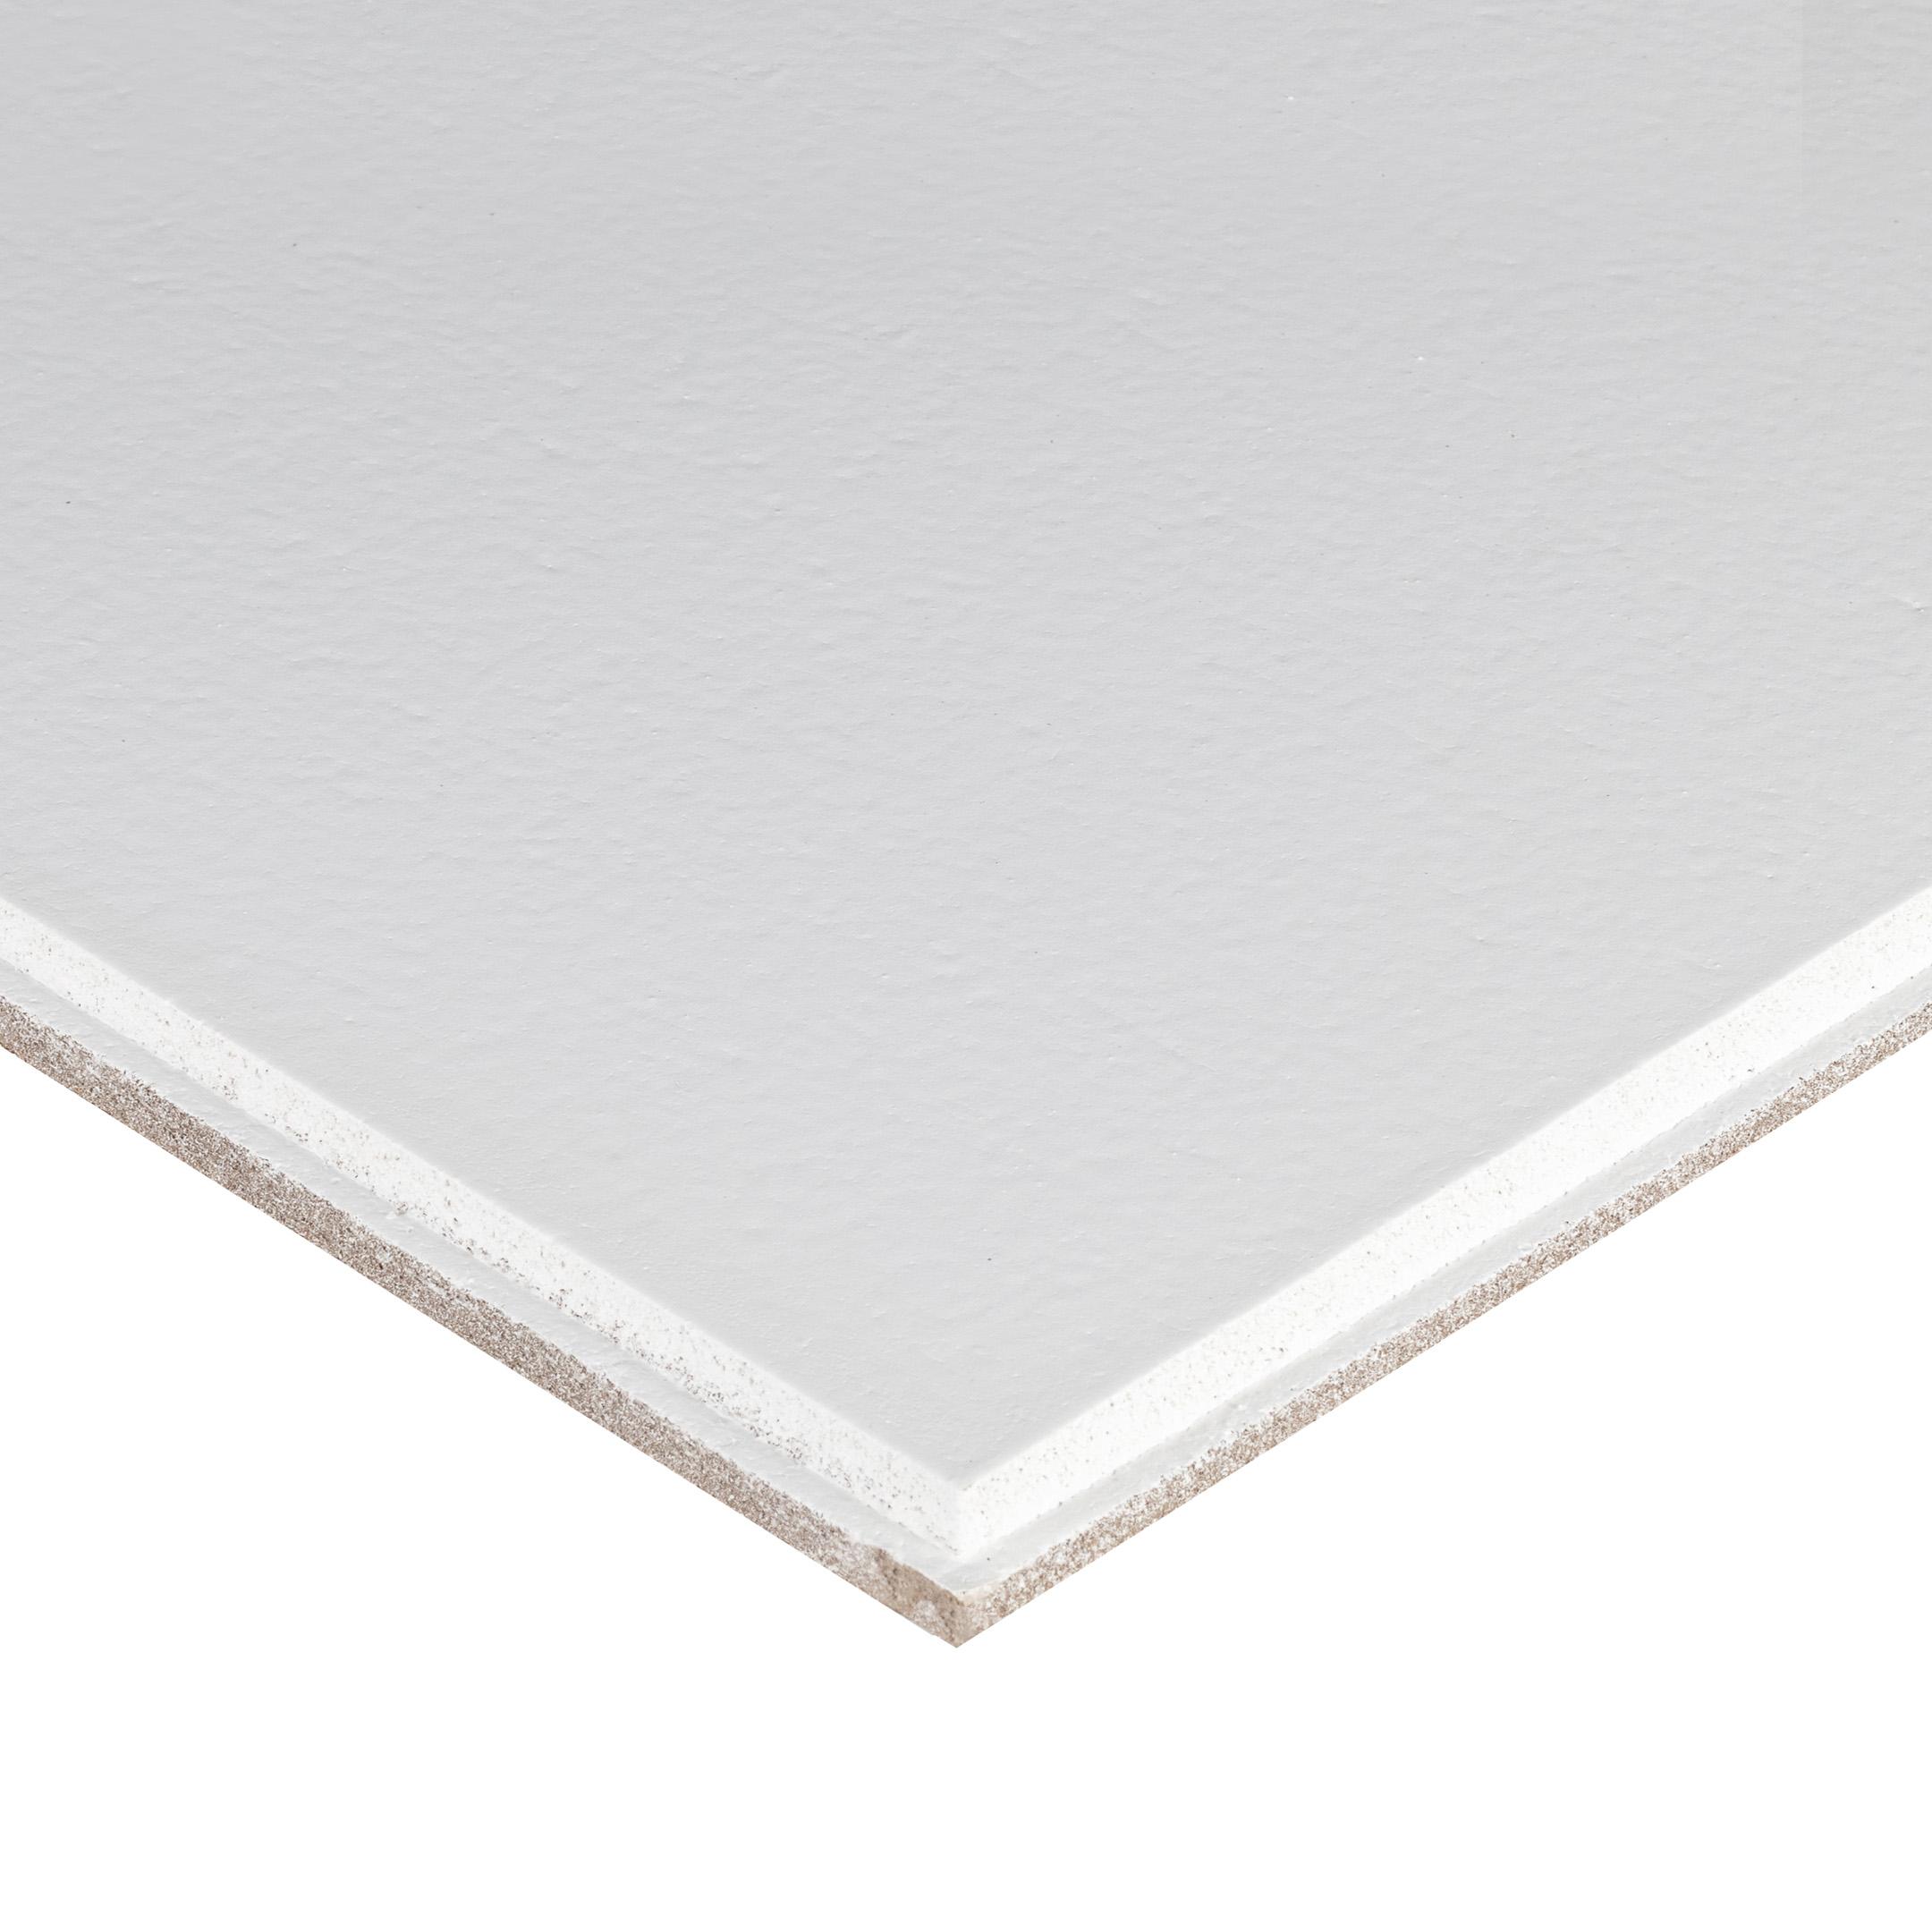 Плита к подвесному потолку 600x600x15 мм Plain Microlook 16 штук фото